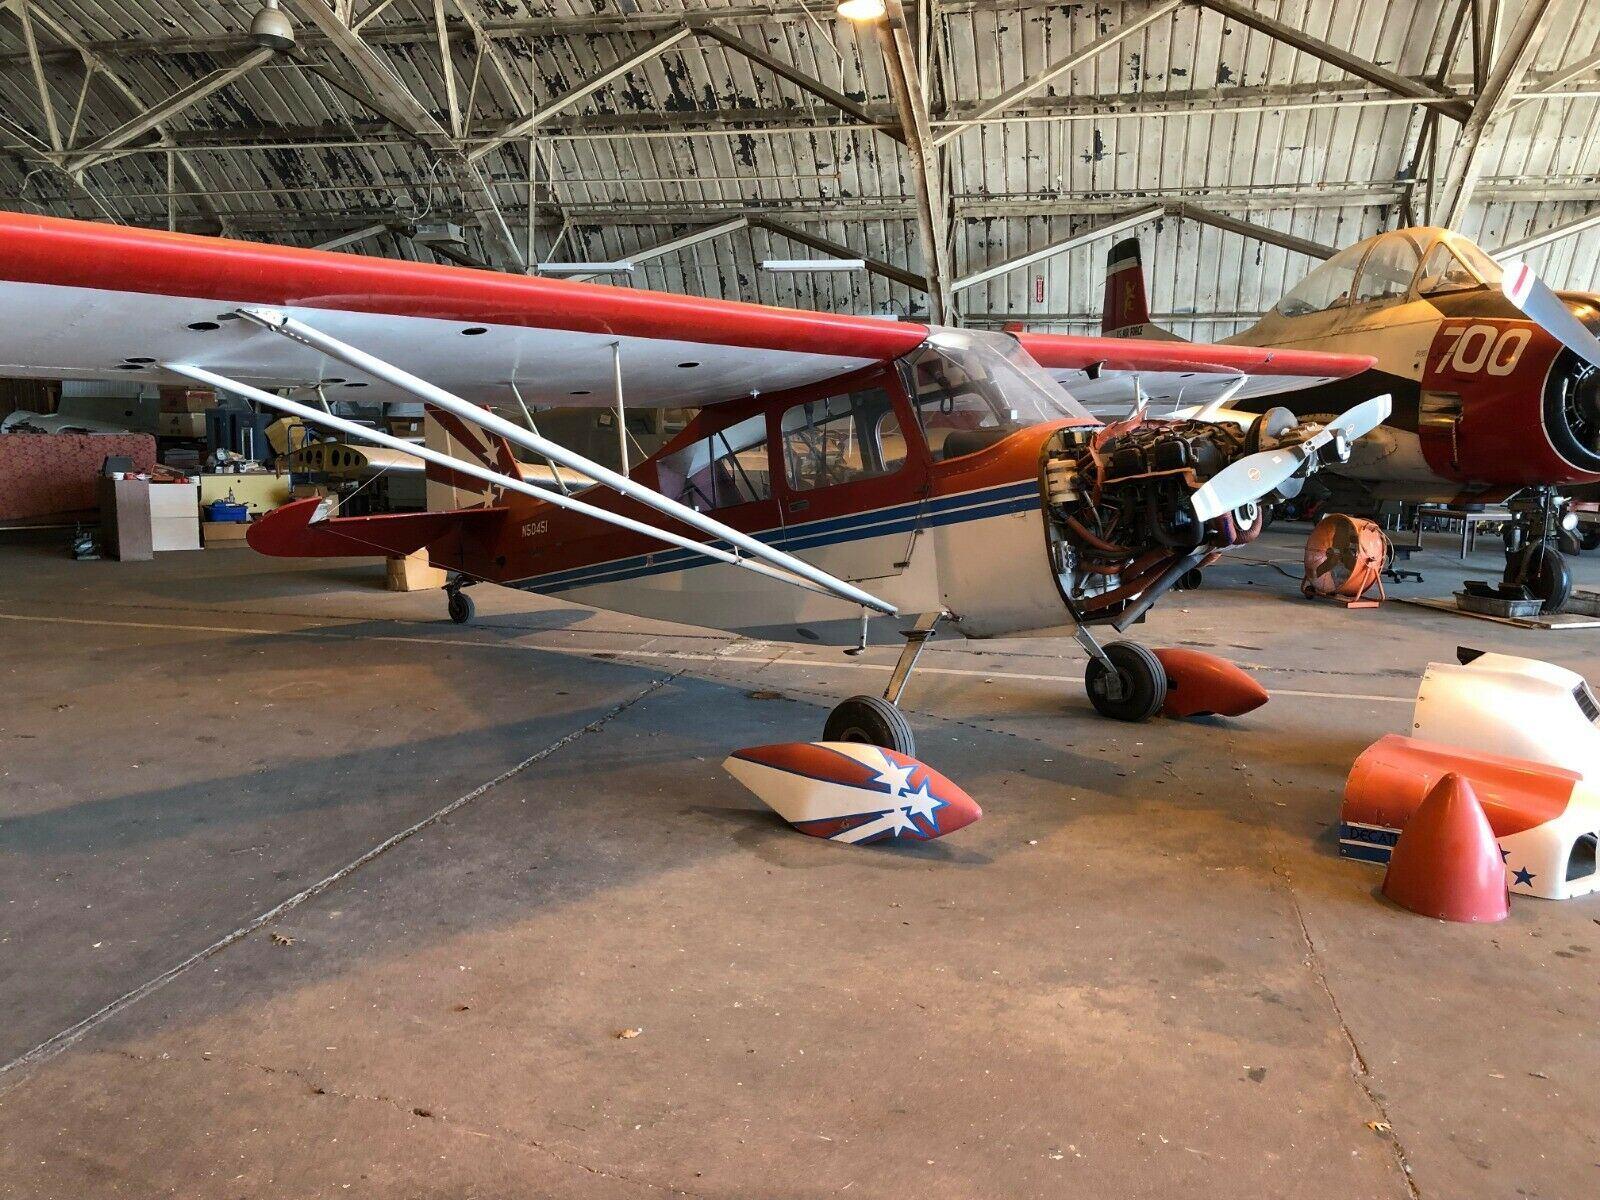 project 1979 Bellanca Decathlon aircraft for sale